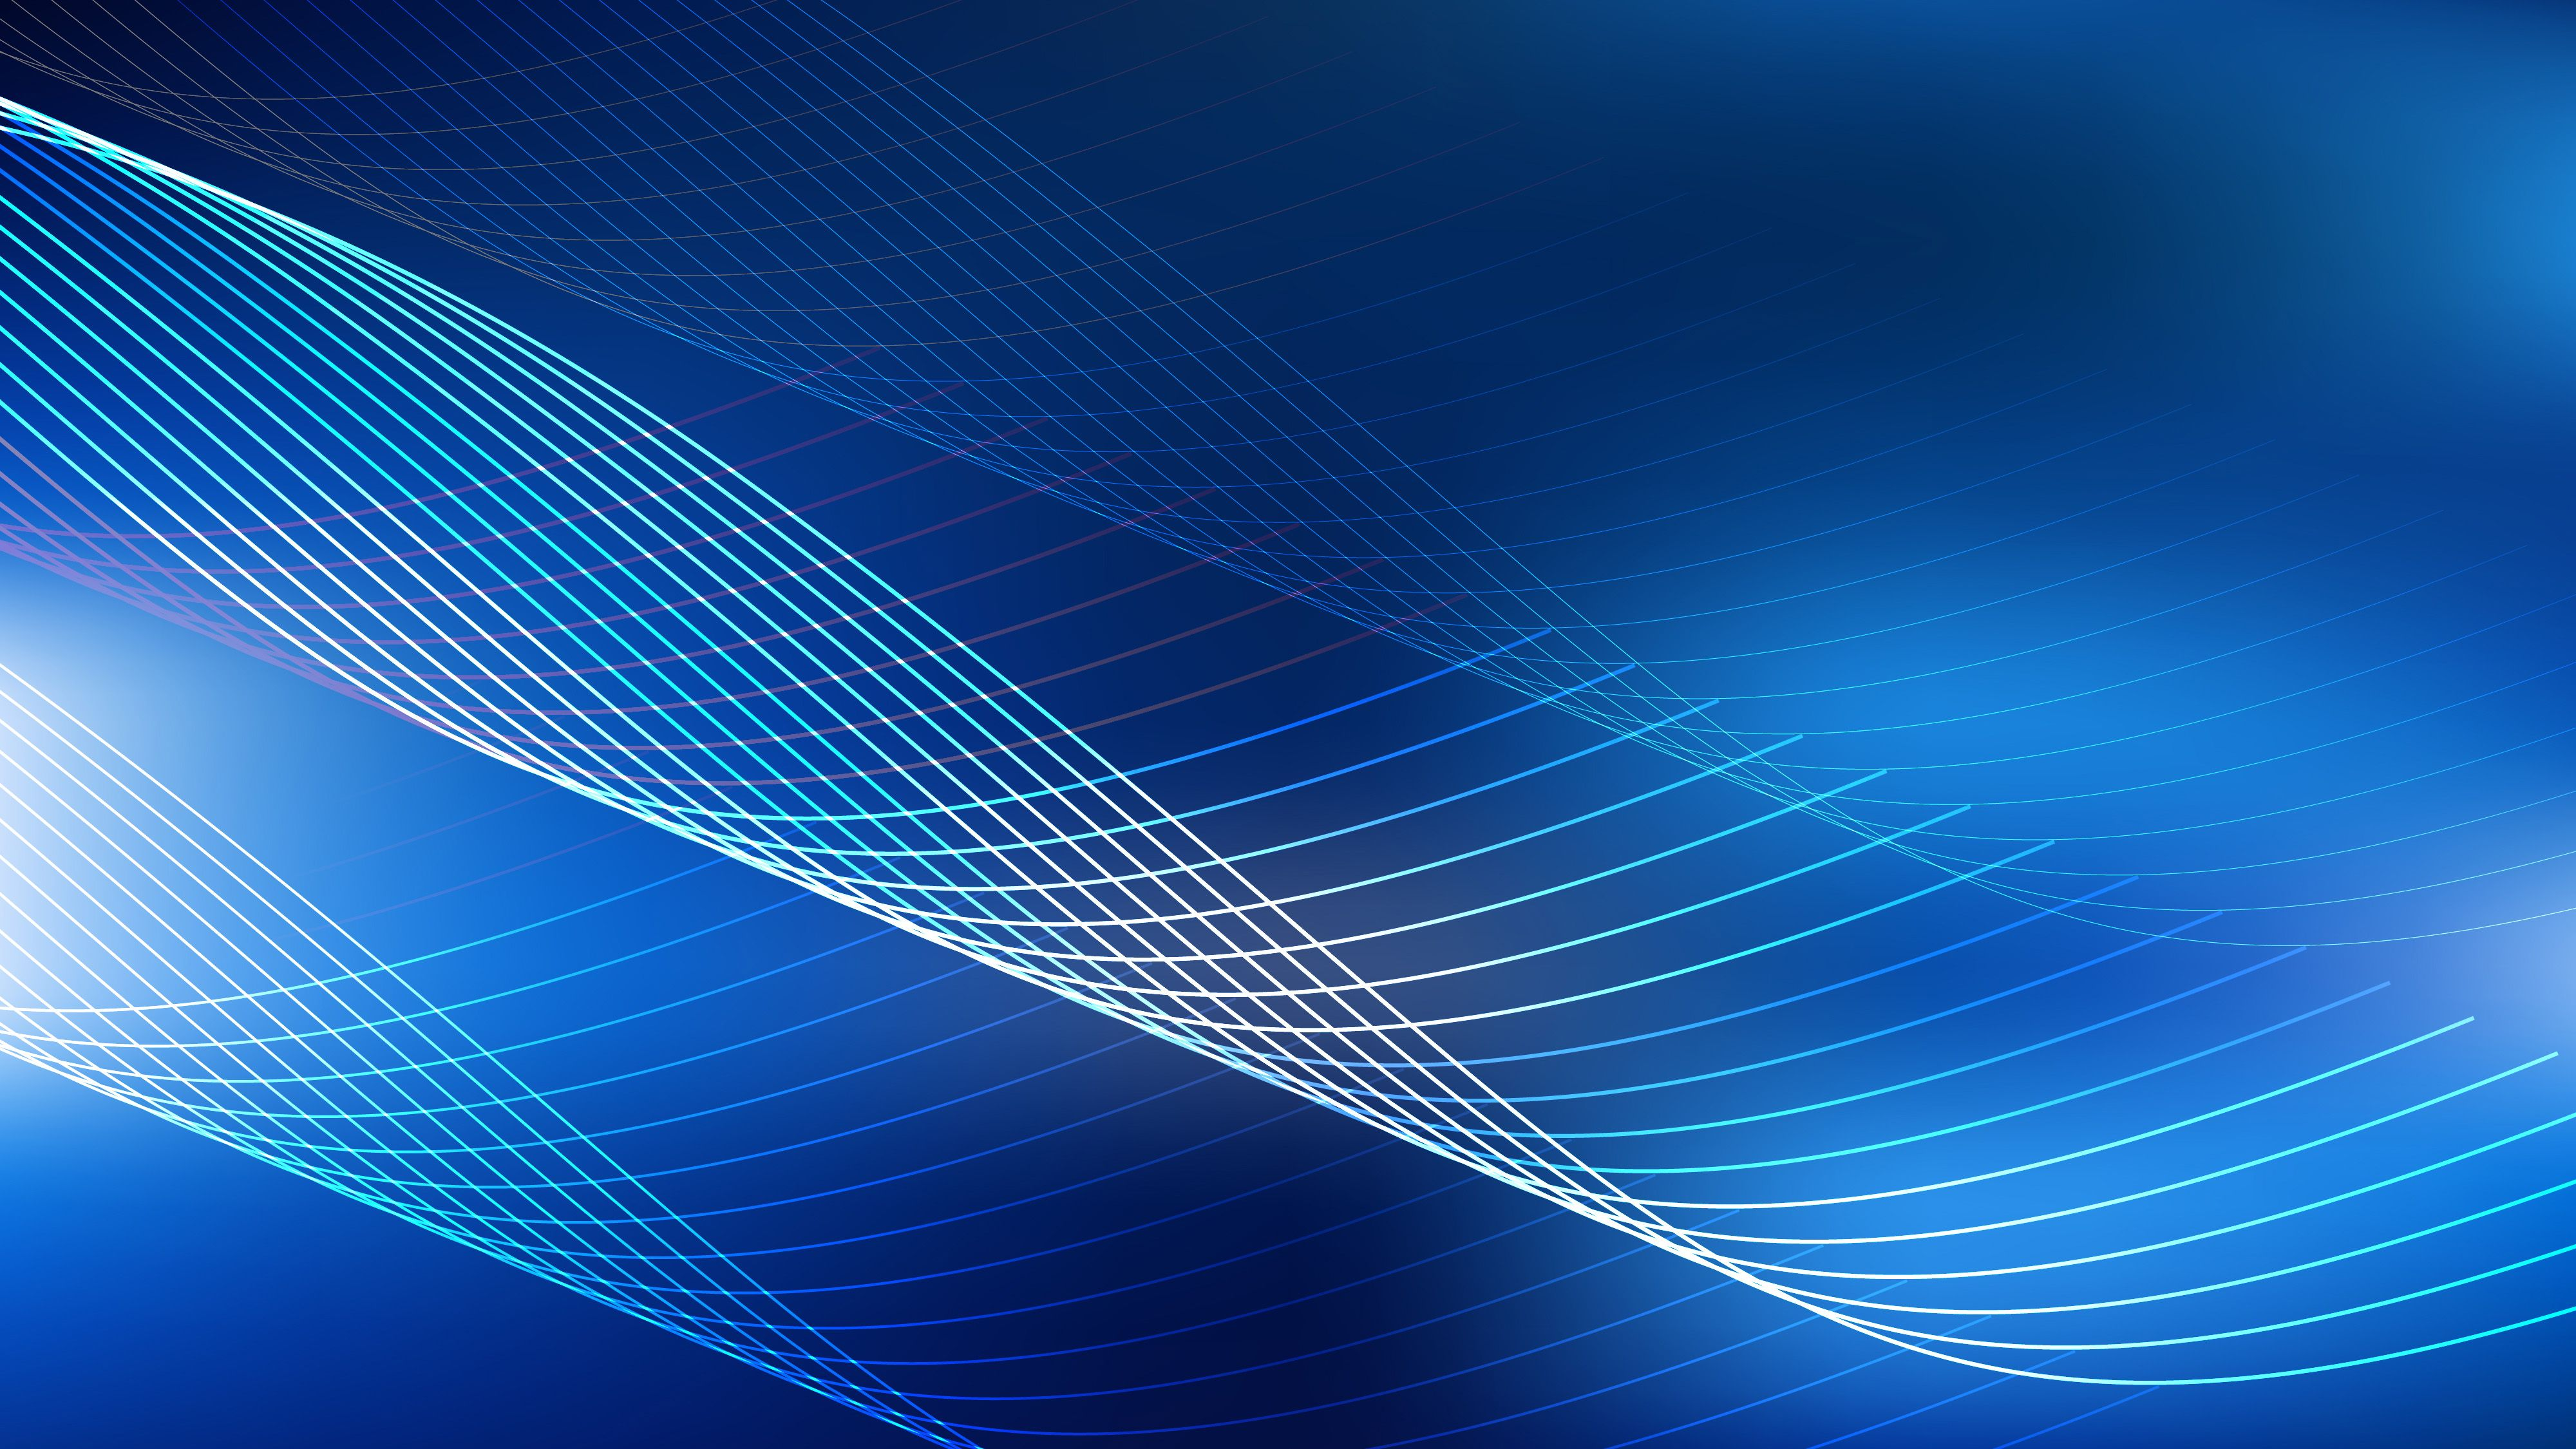 Blue Electric Line   Background Image design 4000x2250